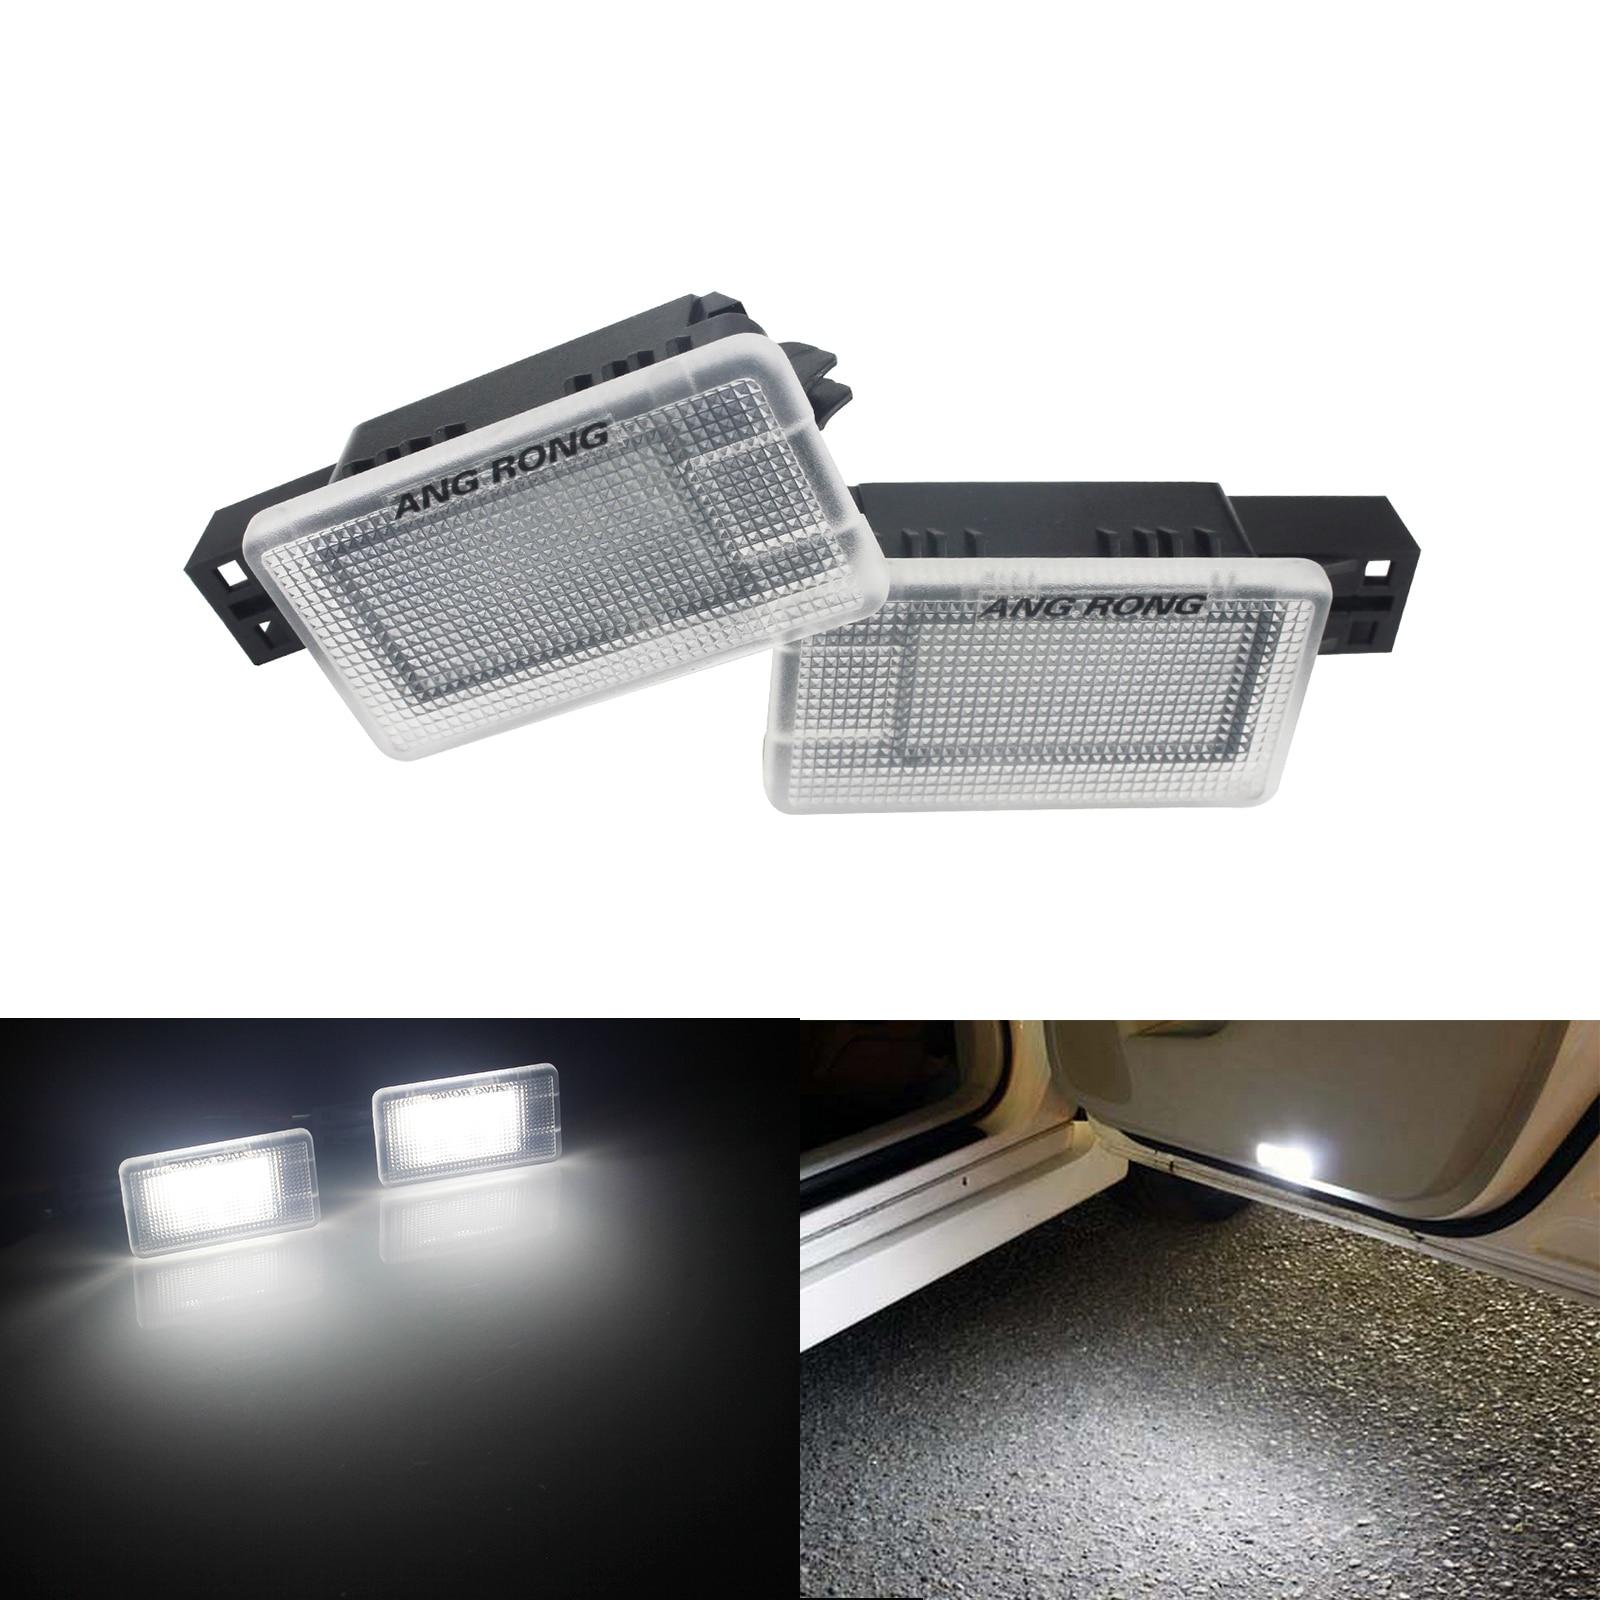 ANGRONG Pour Volvo LED Footwell Courtoisie Porte Lumière Latérale Blanc V70 XC70 XC60 V60 V40 S60 S80